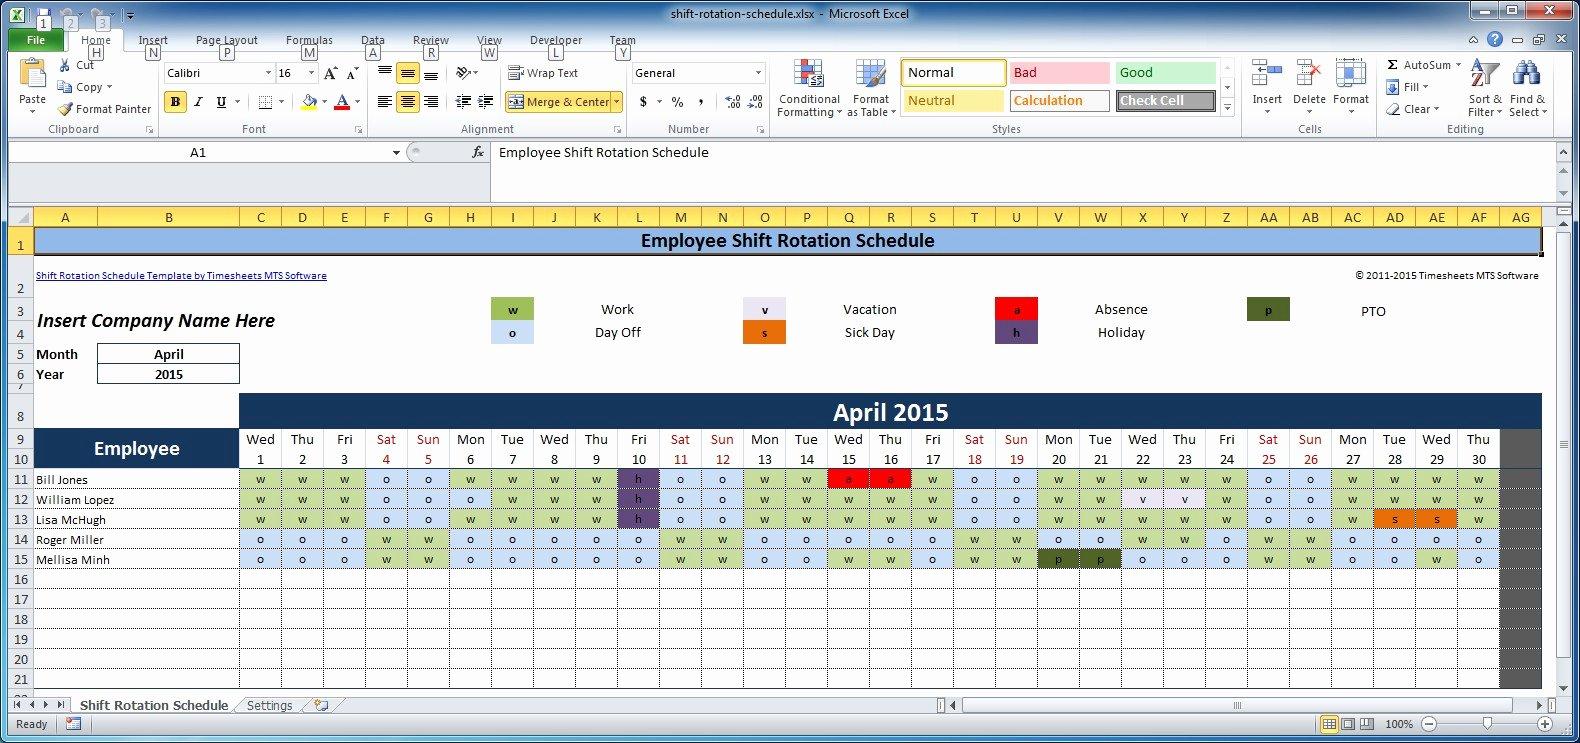 Excel Employee Shift Schedule Template Unique Free Employee and Shift Schedule Templates